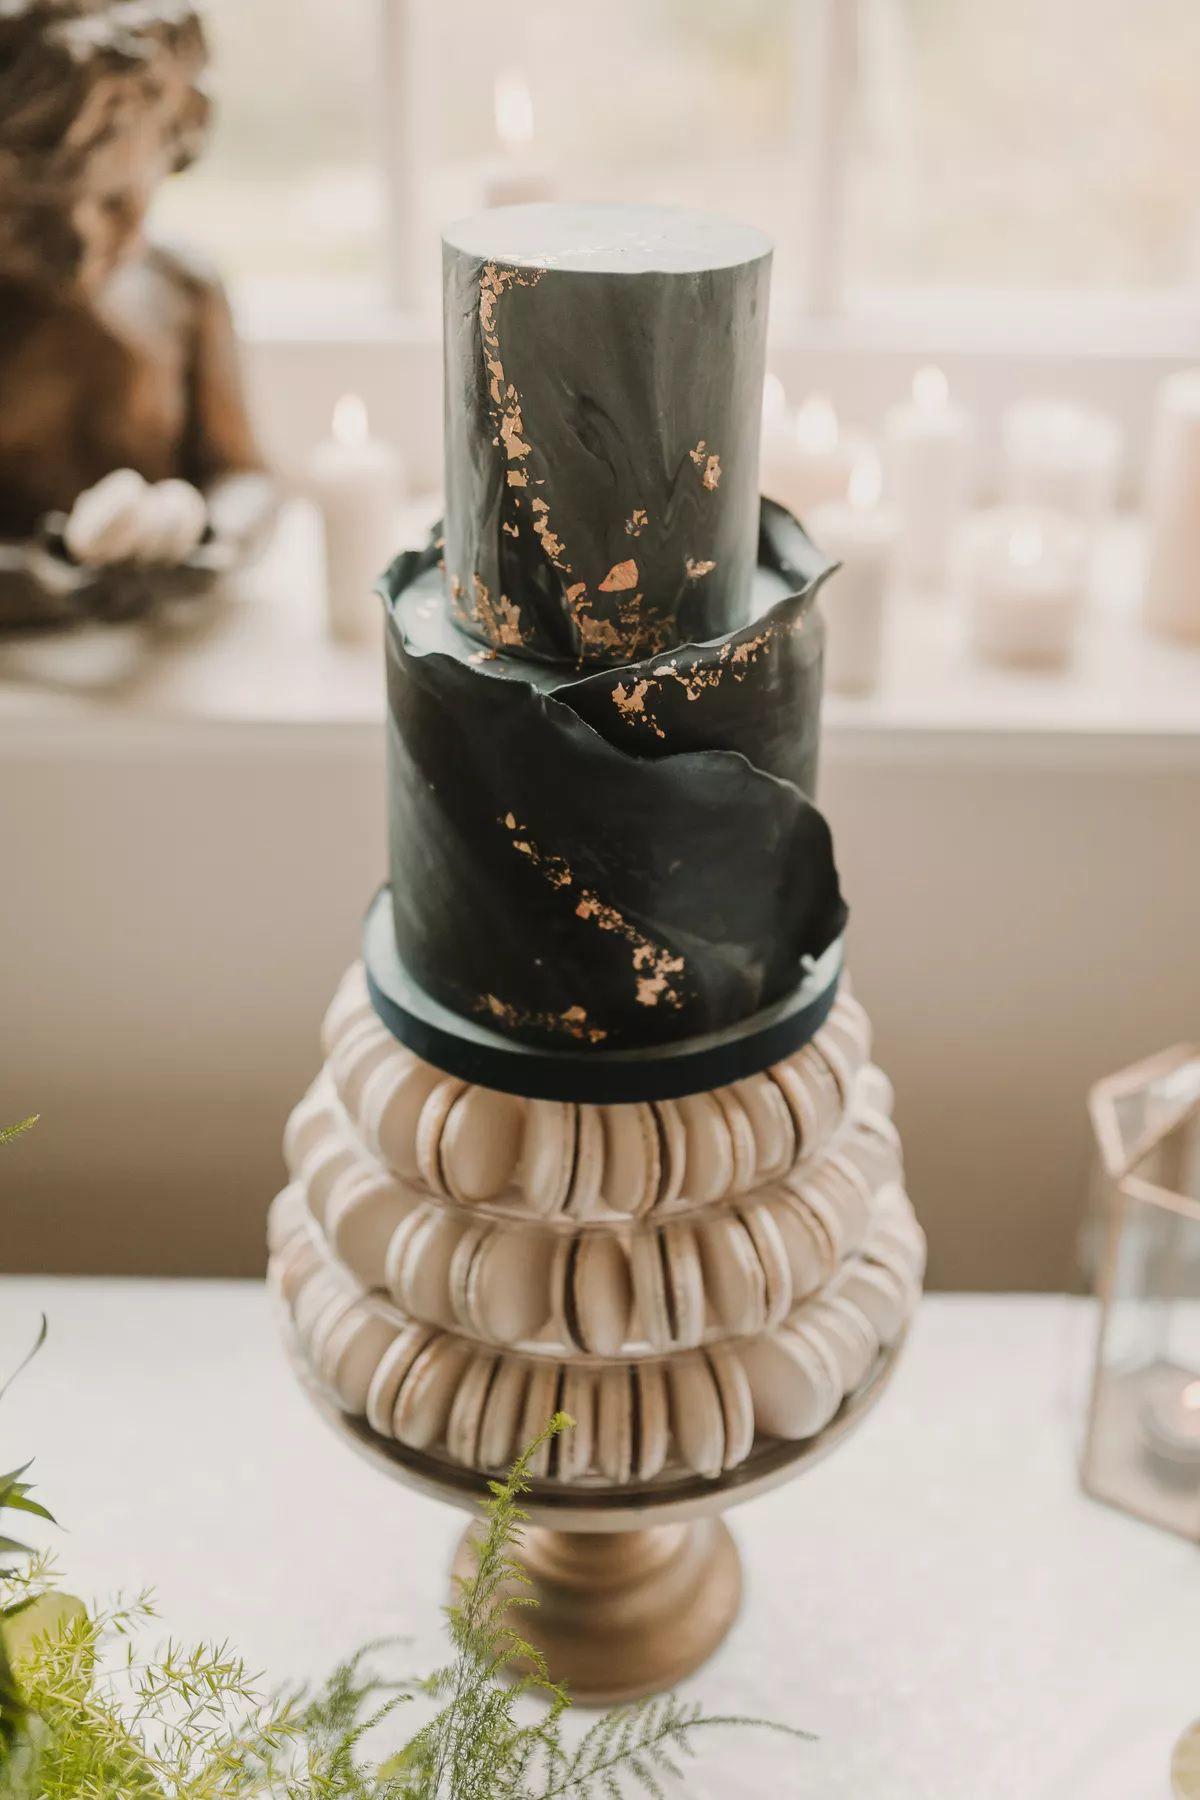 Dramatic macaron wedding cake